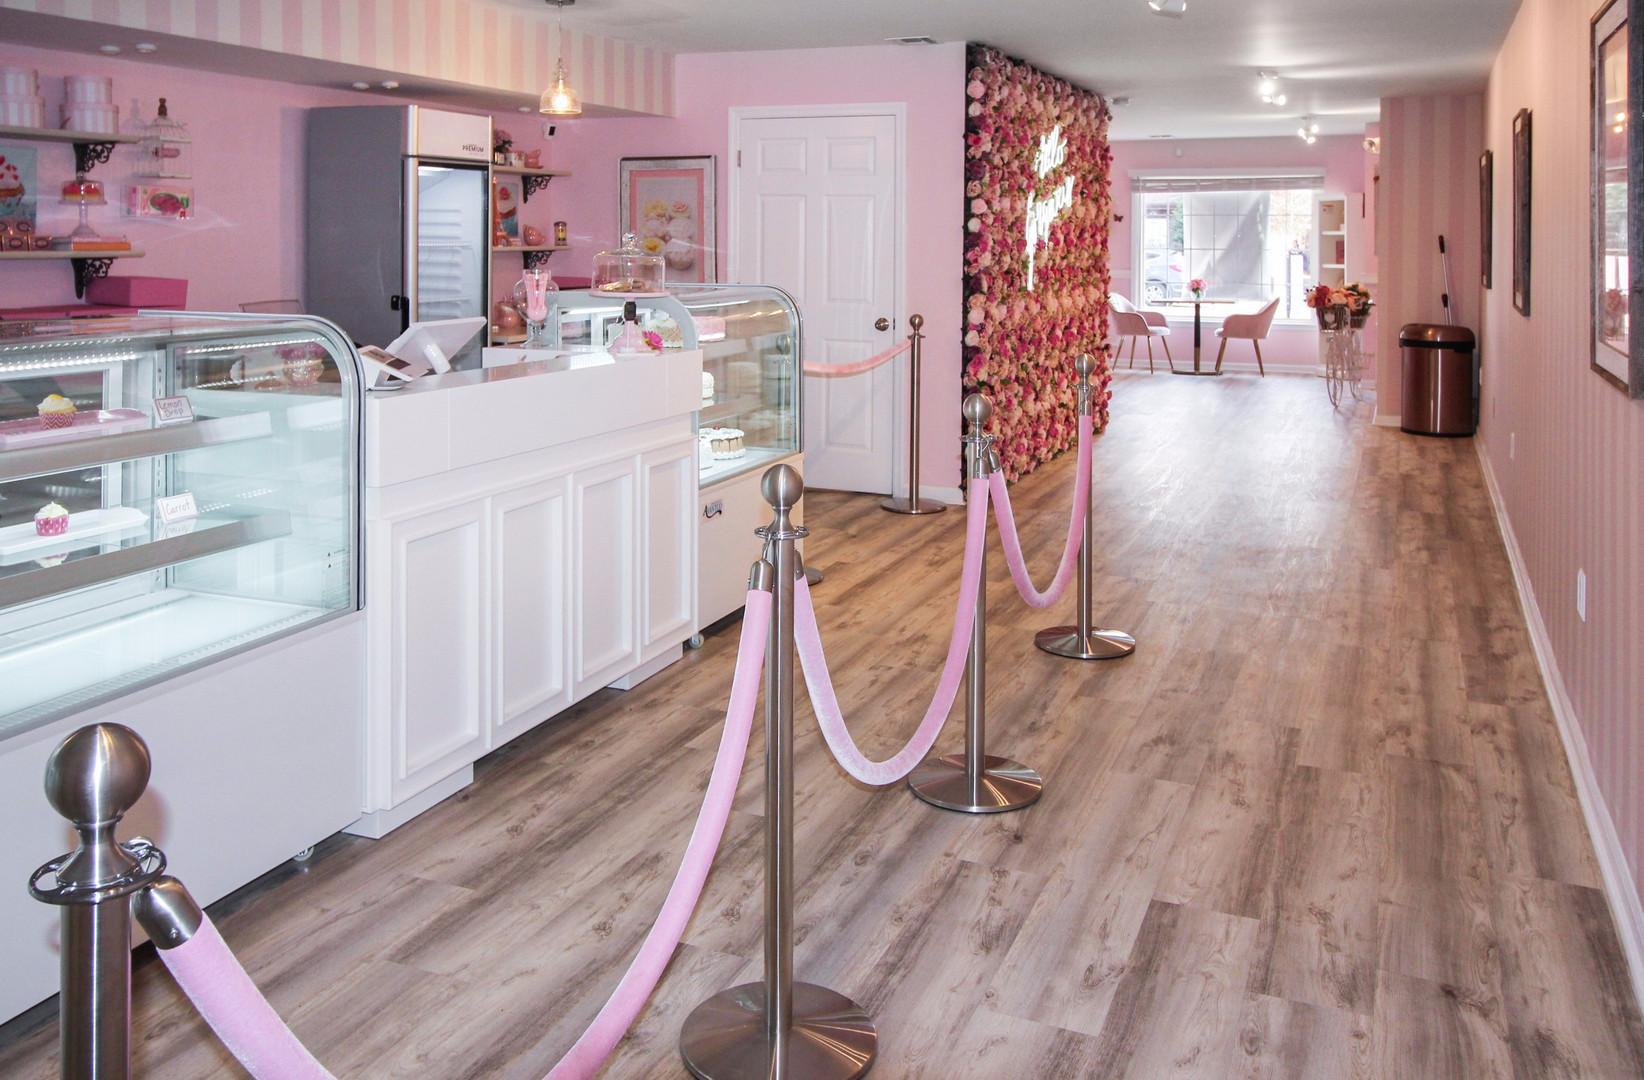 Beautiful Interior Design at Pinkies